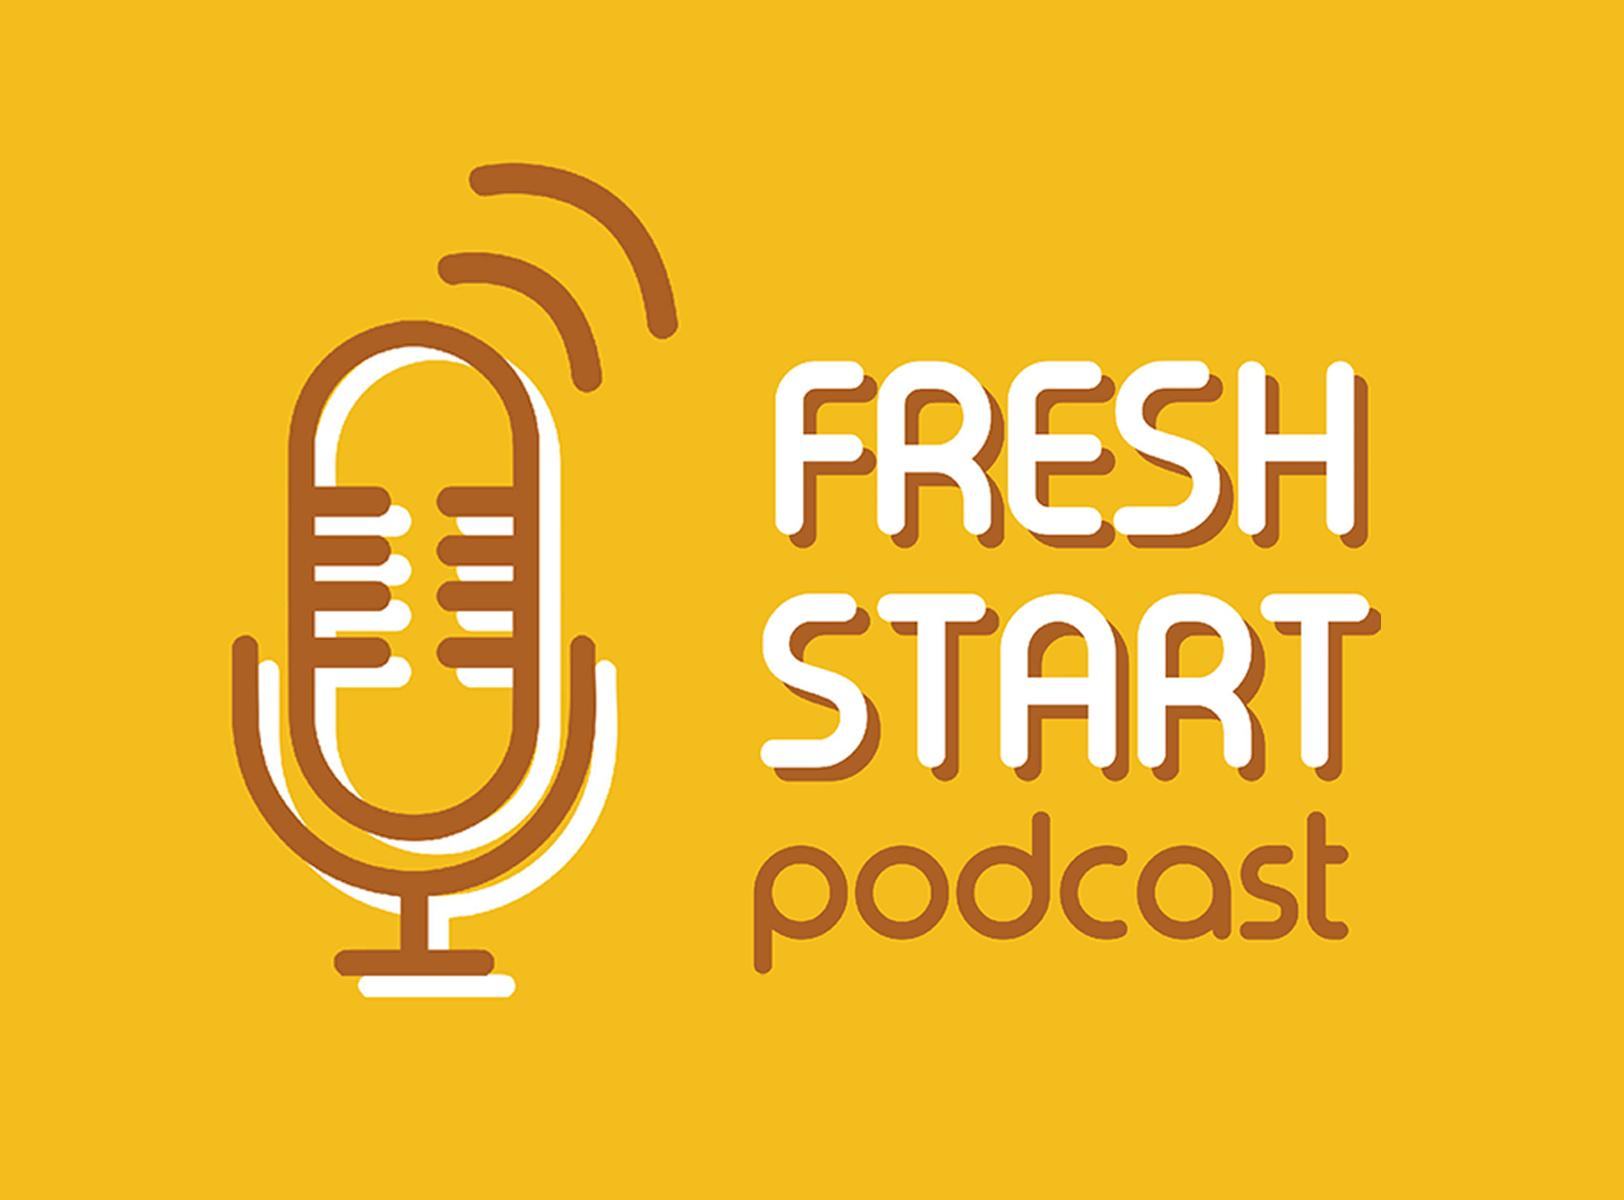 Fresh Start: Podcast News (12/29/2019 Sun.)